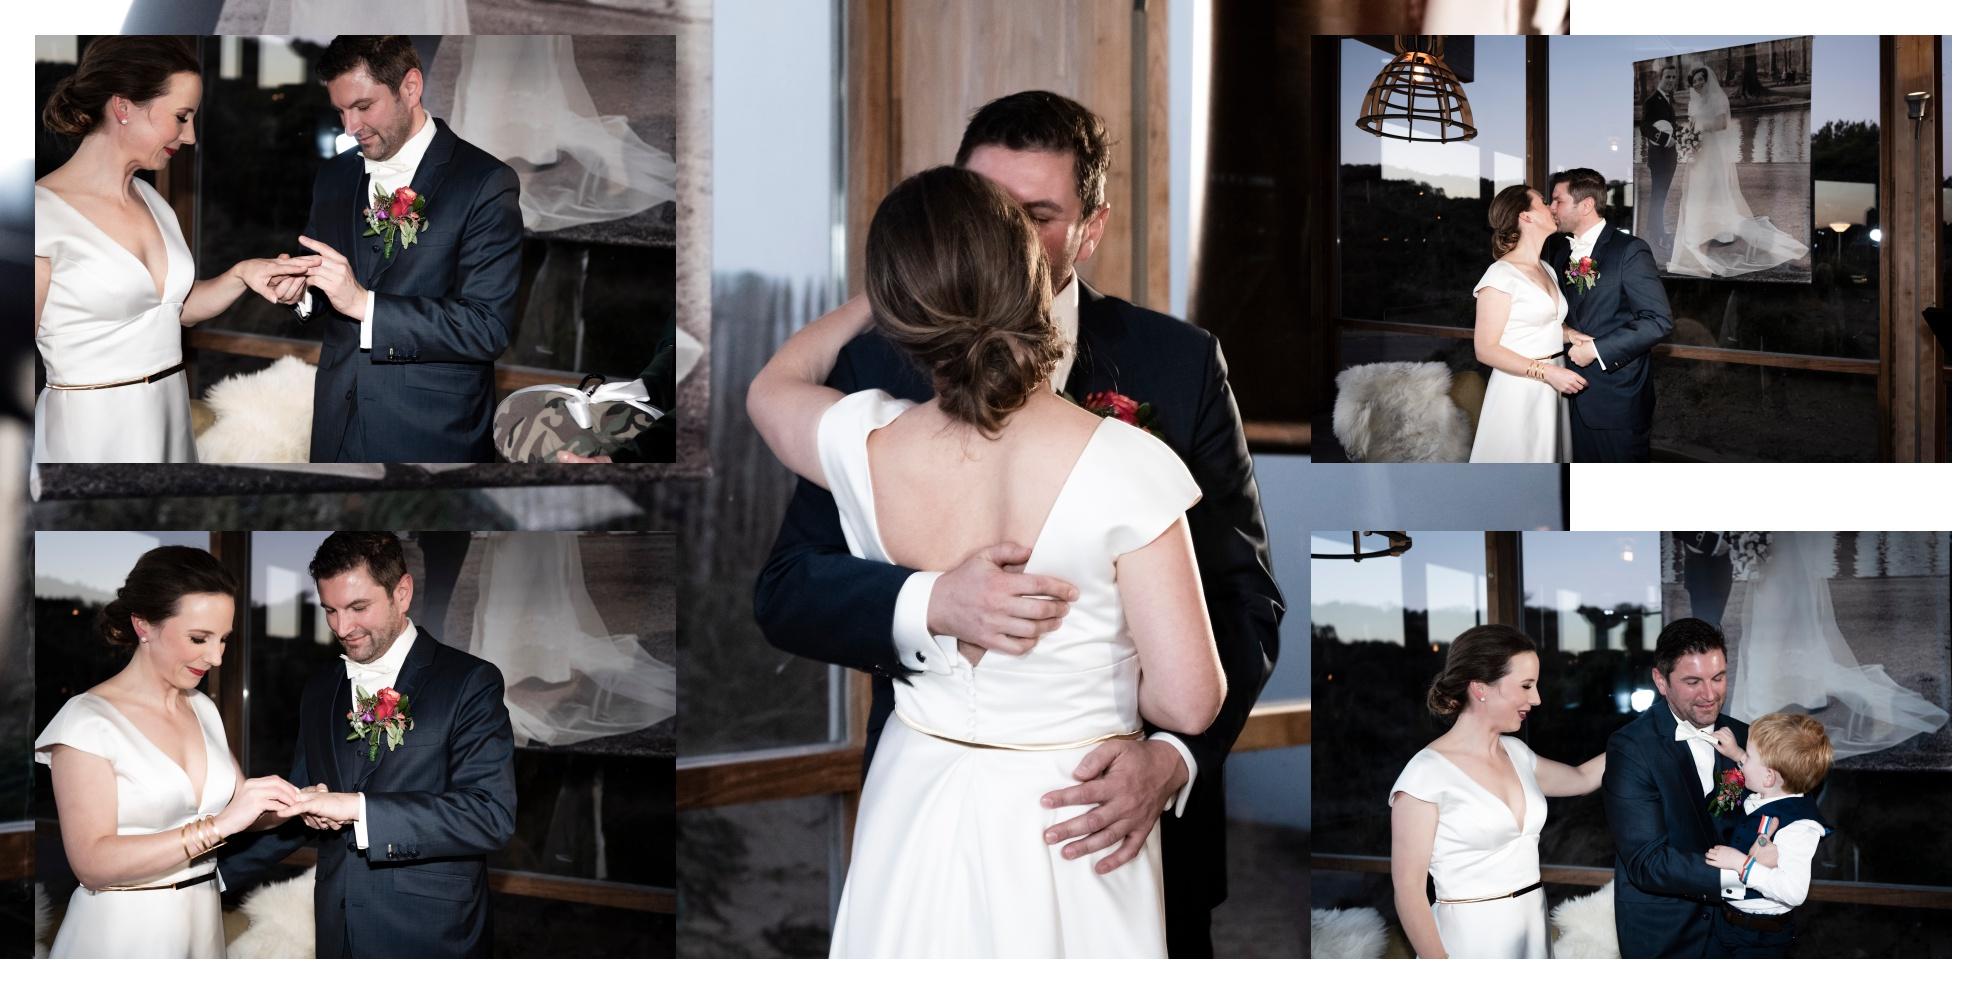 Bruidsfotograaf Trouwfotograaf huwelijksfotograaf trouwreportage bruidsfotograaf huwelijksreportage trouwfotograaf heemstede Haarlem Noord-Holland Zalmiy Paeez fotogrfie